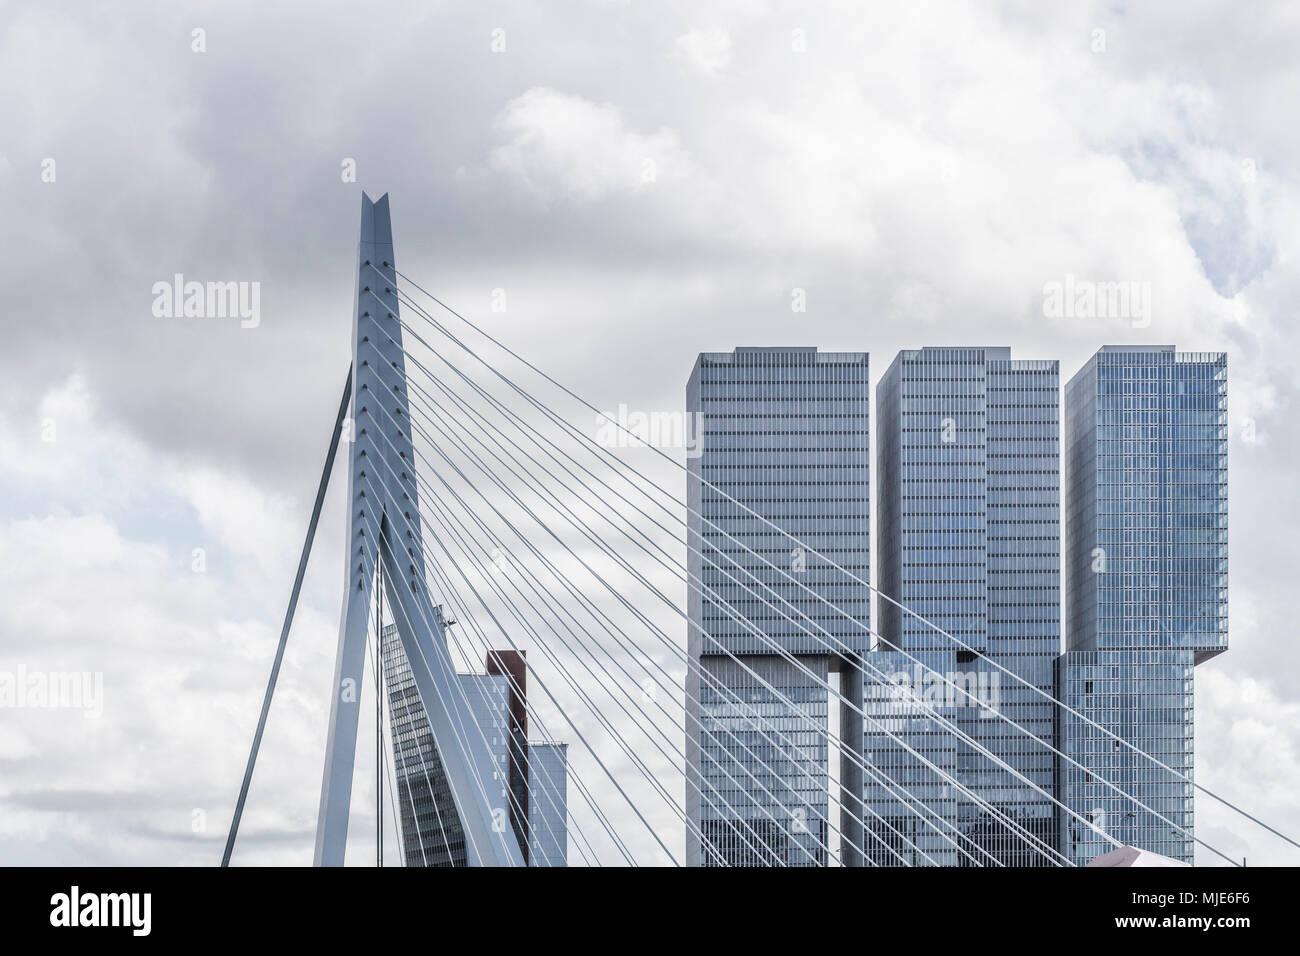 Erasmusbrücke, Detail in Rotterdam - Stock Image